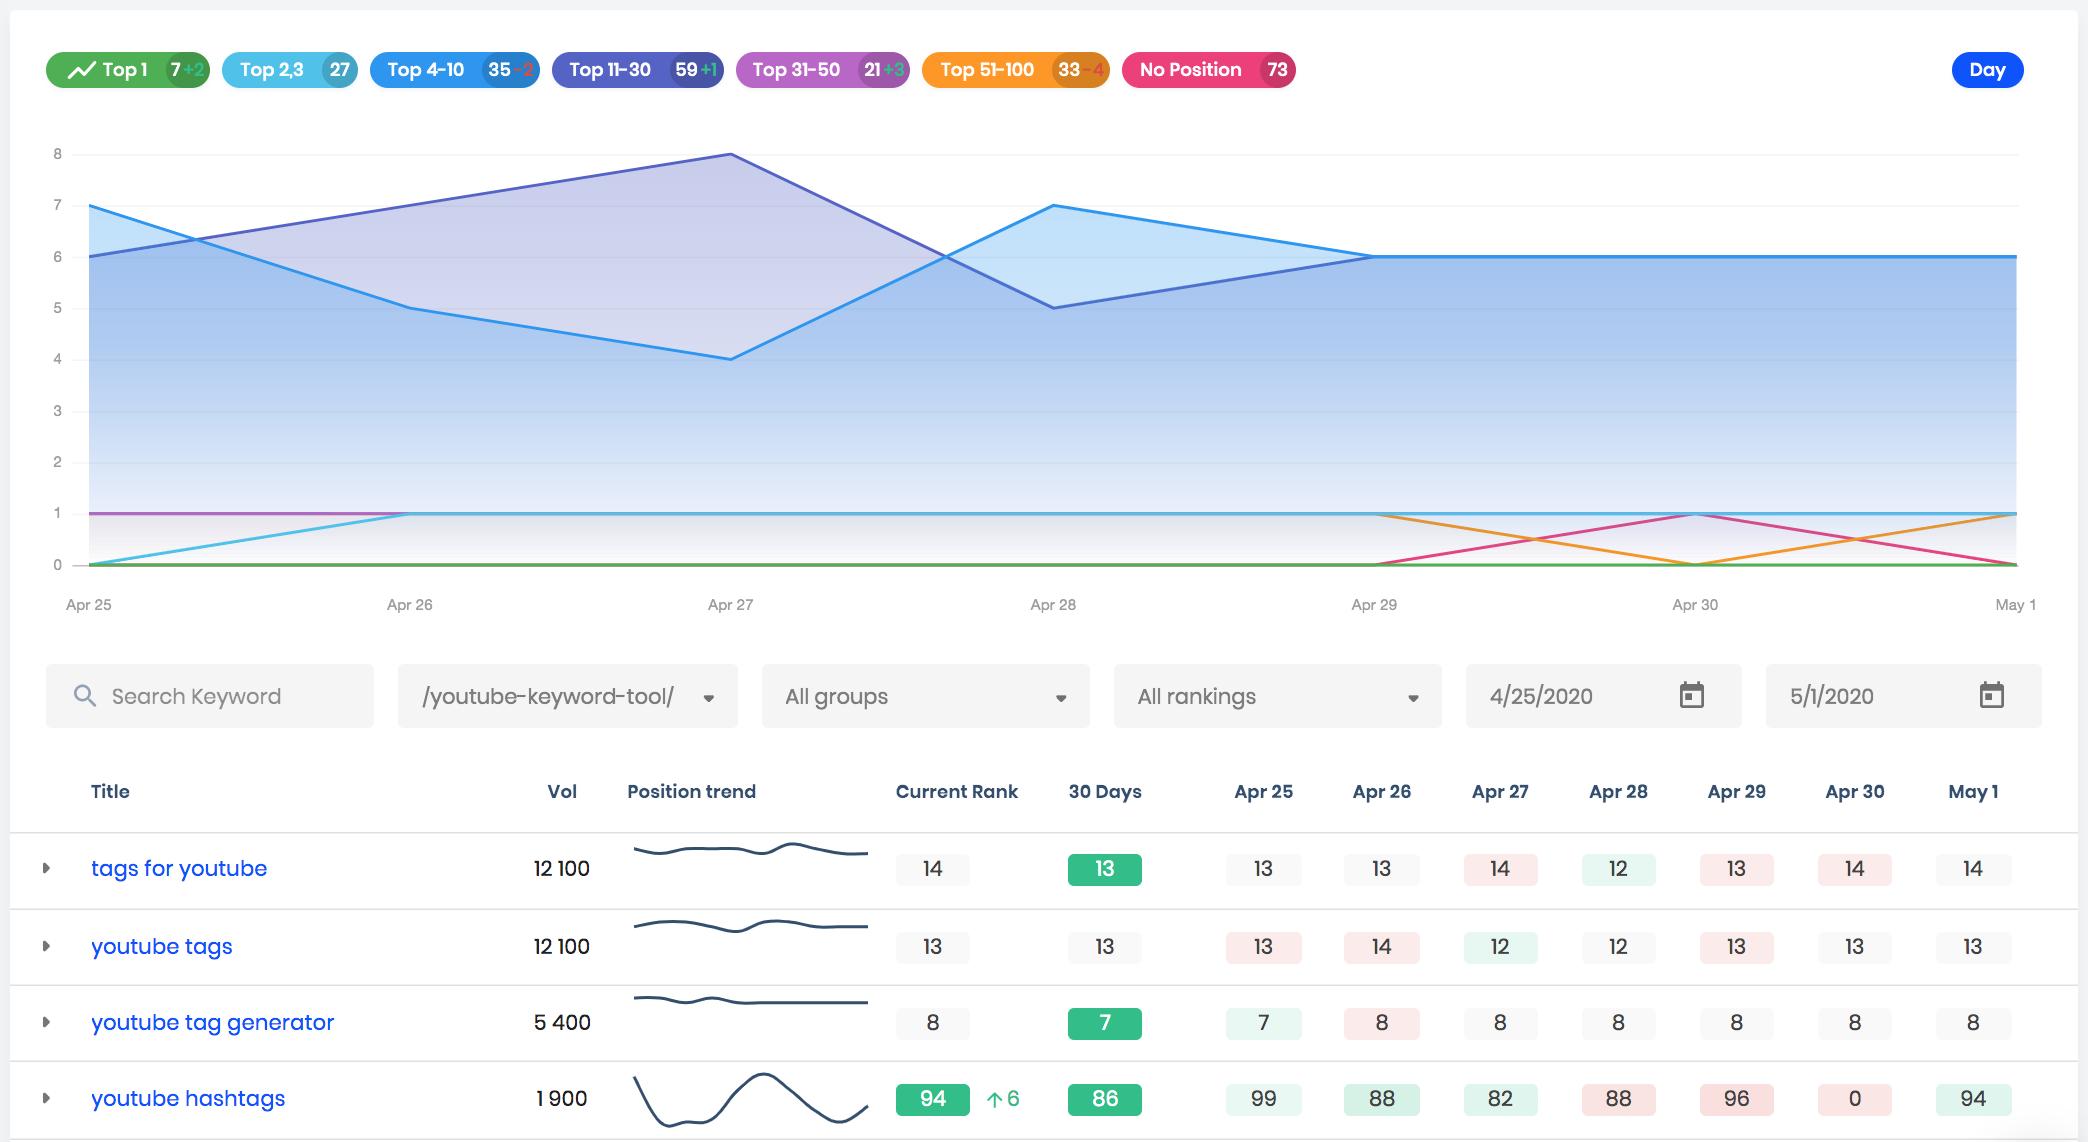 rank tracker design update april 2020